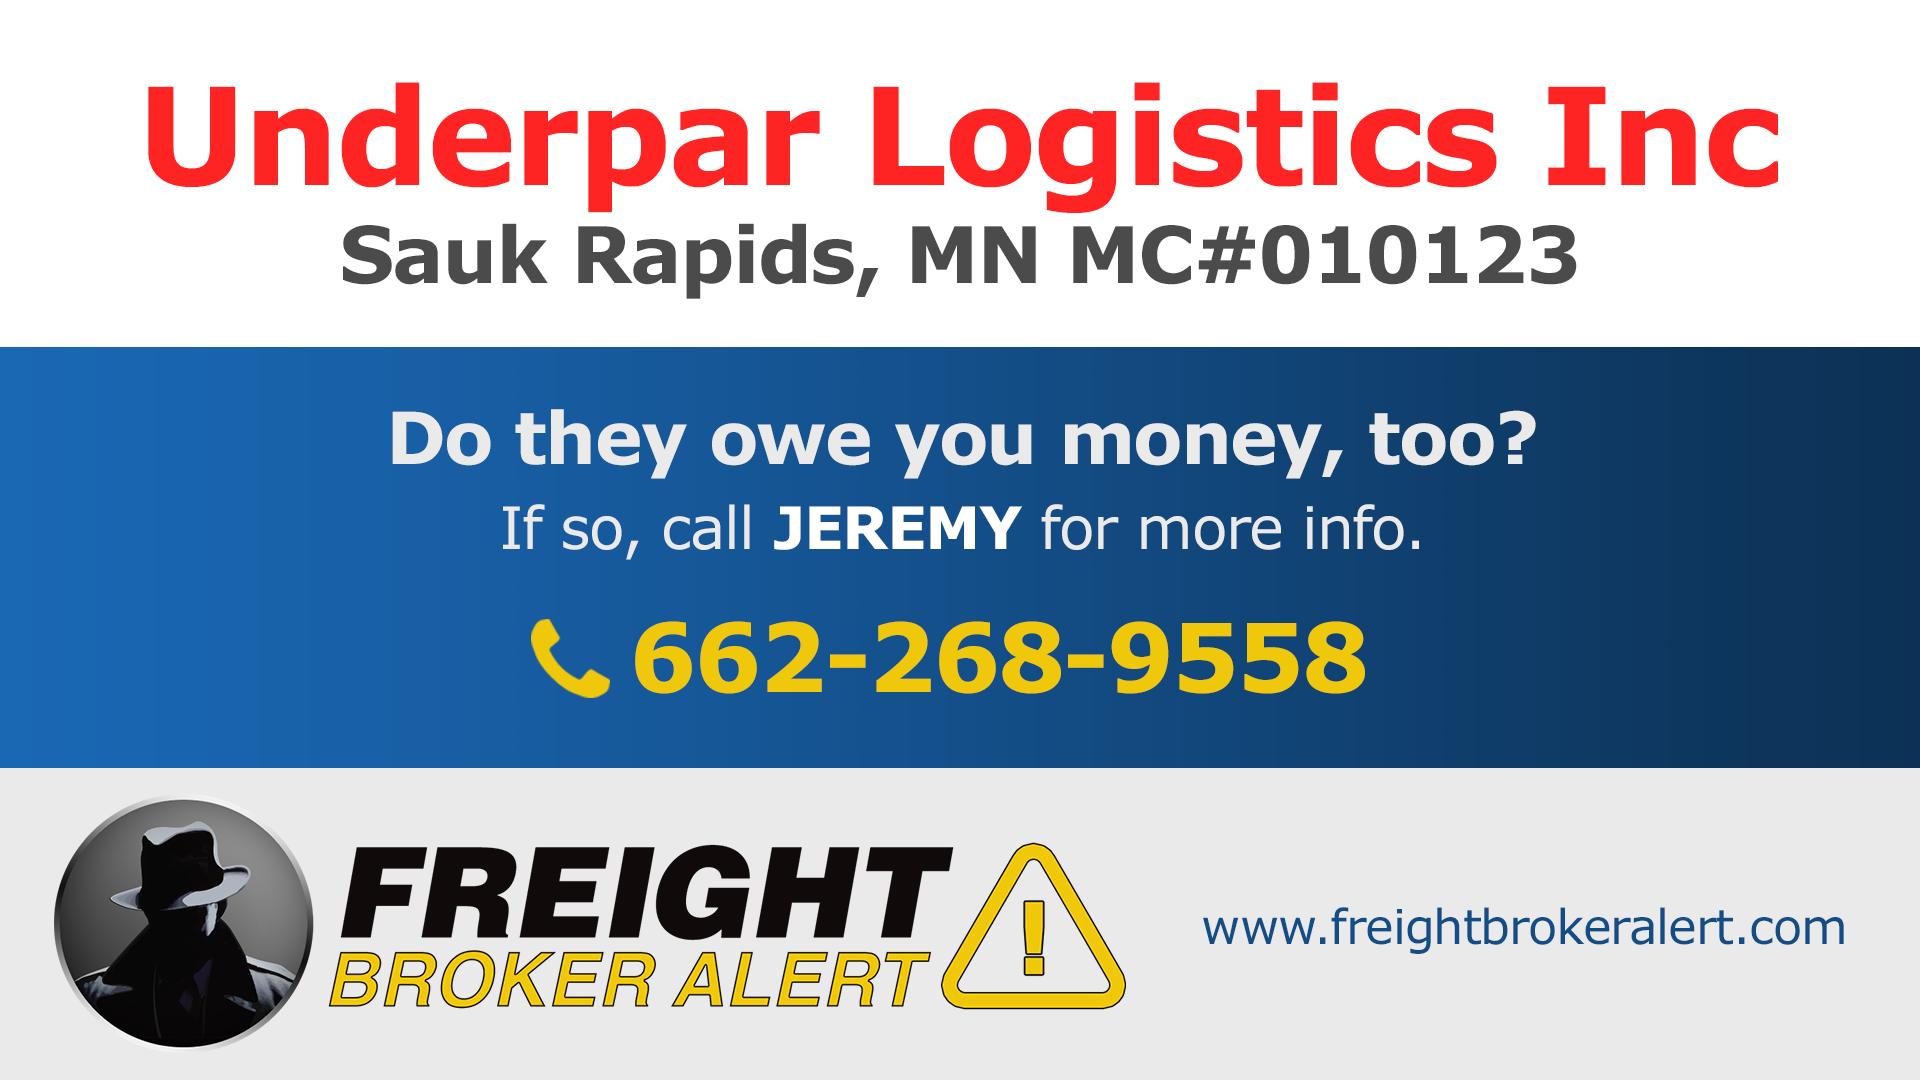 Underpar Logistics Inc Minnesota